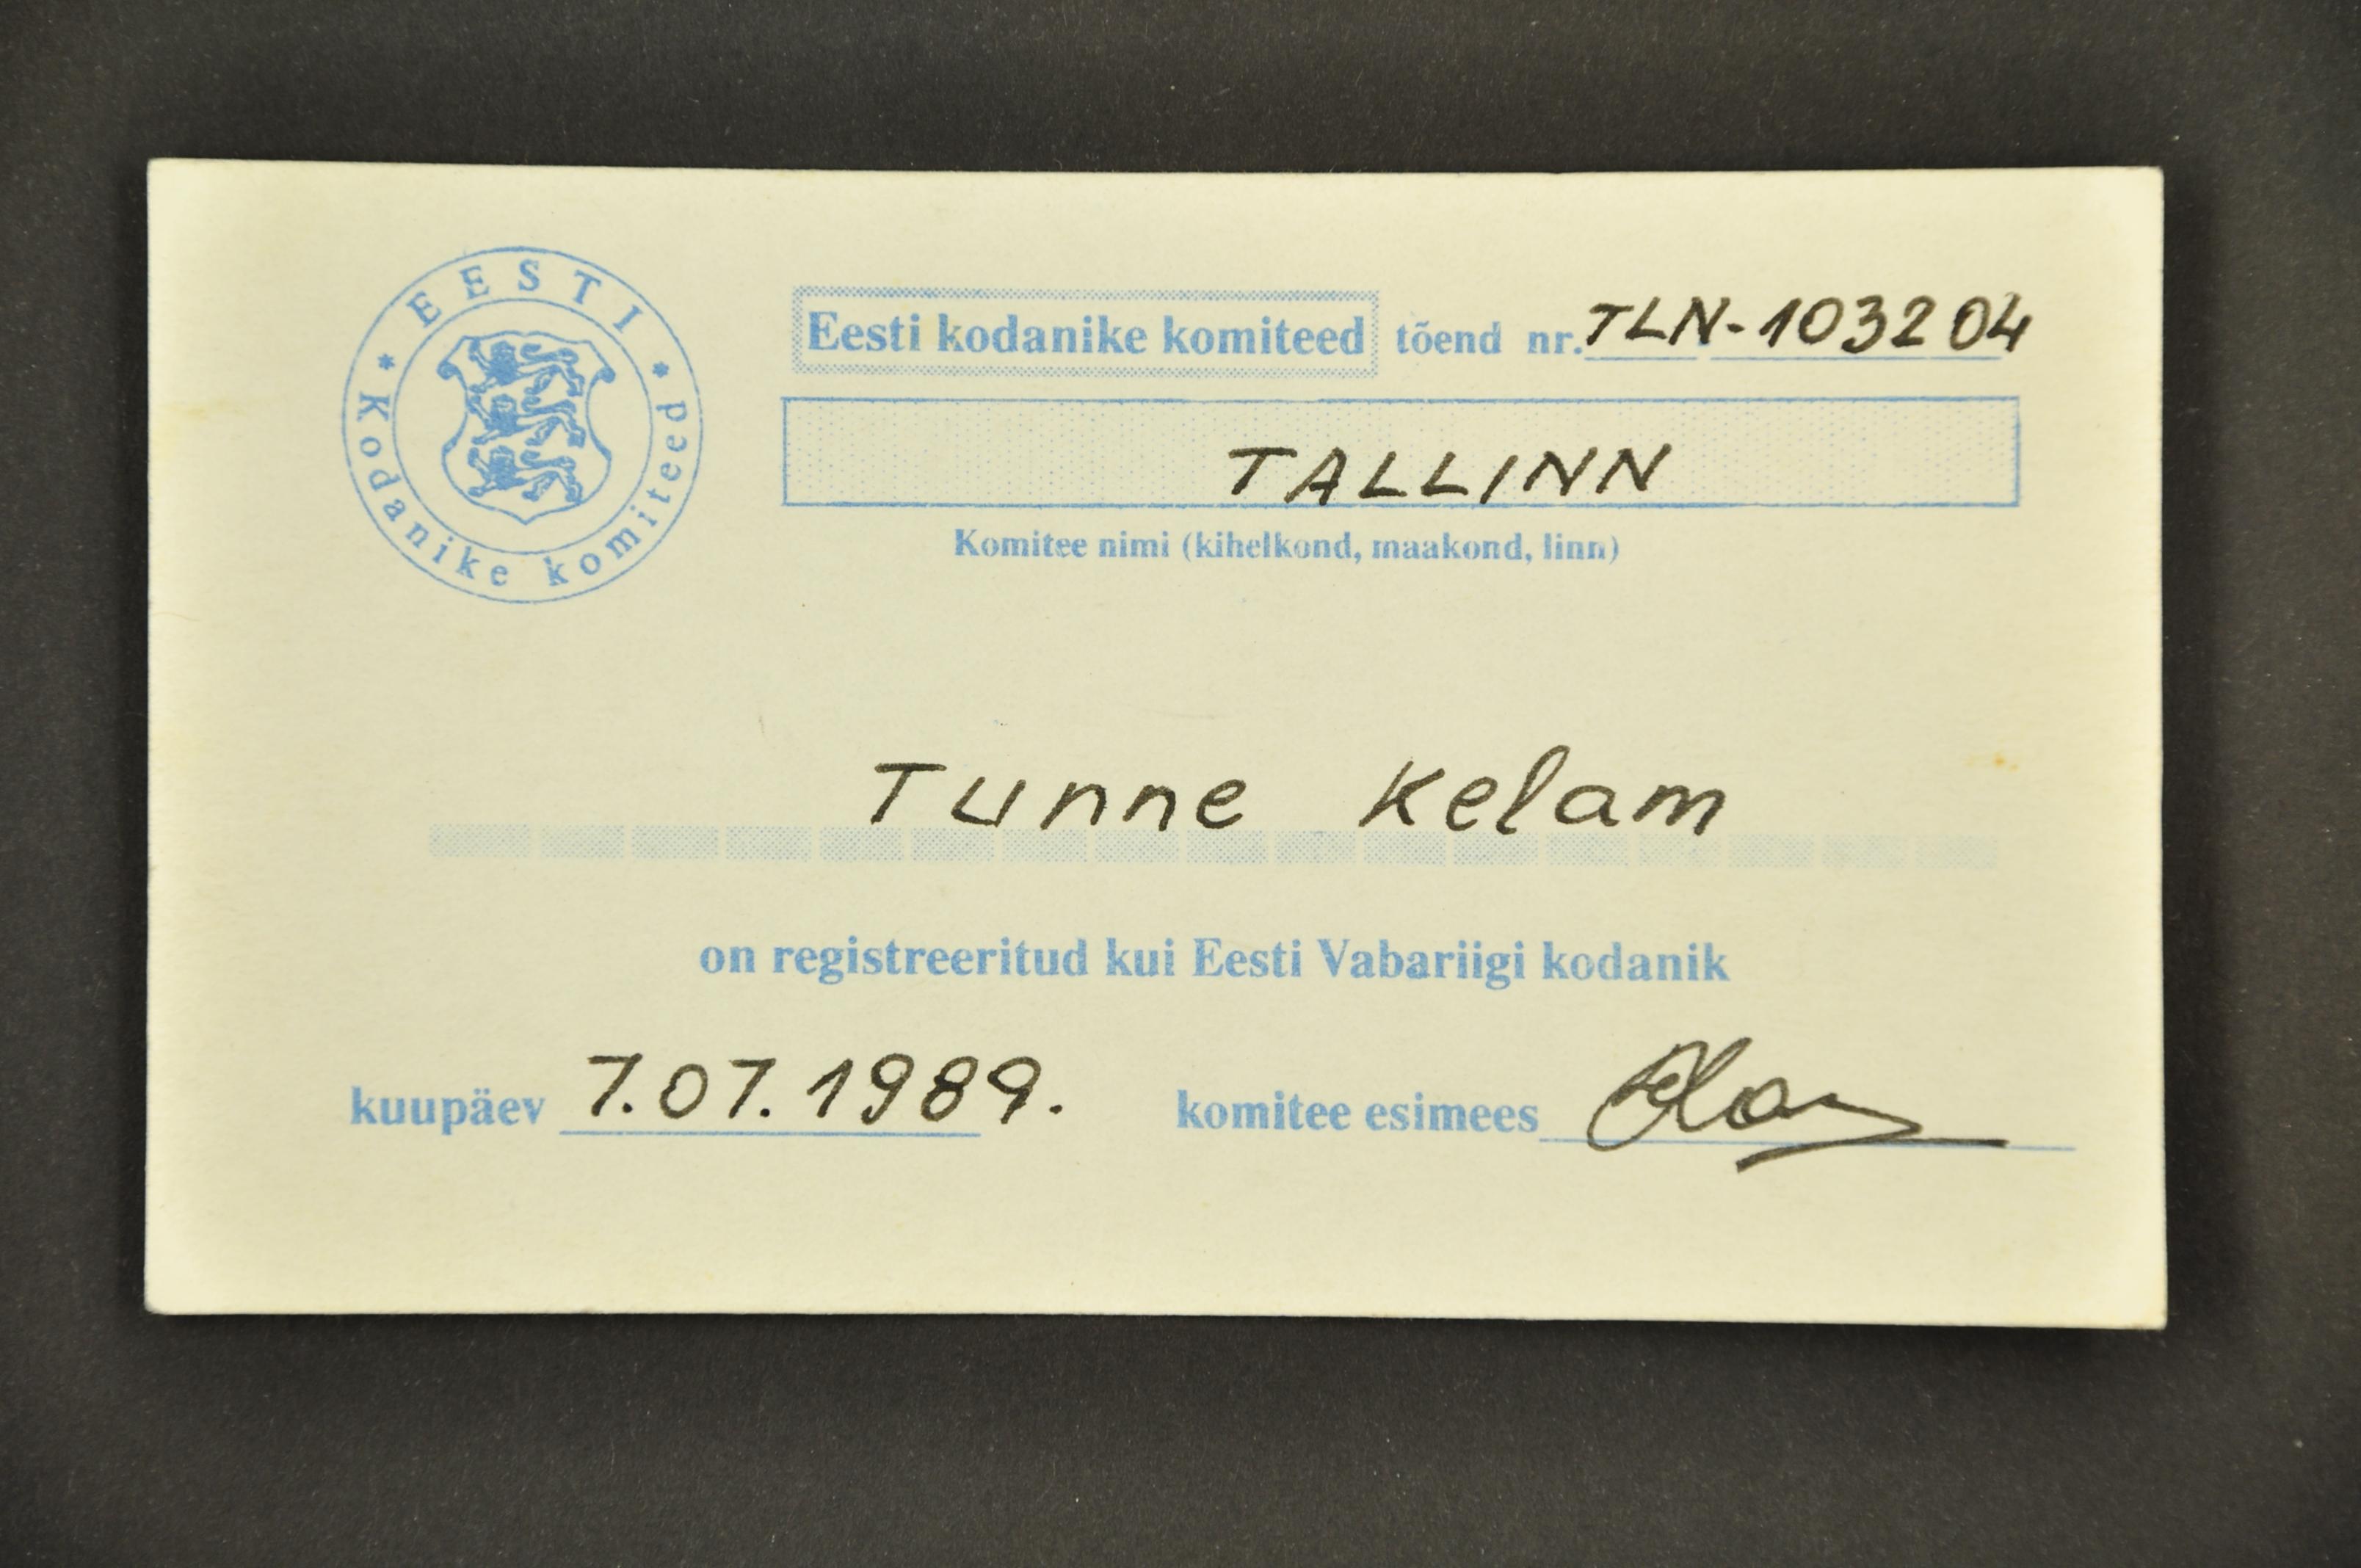 Estonian Citizens' Committees - Wikipedia